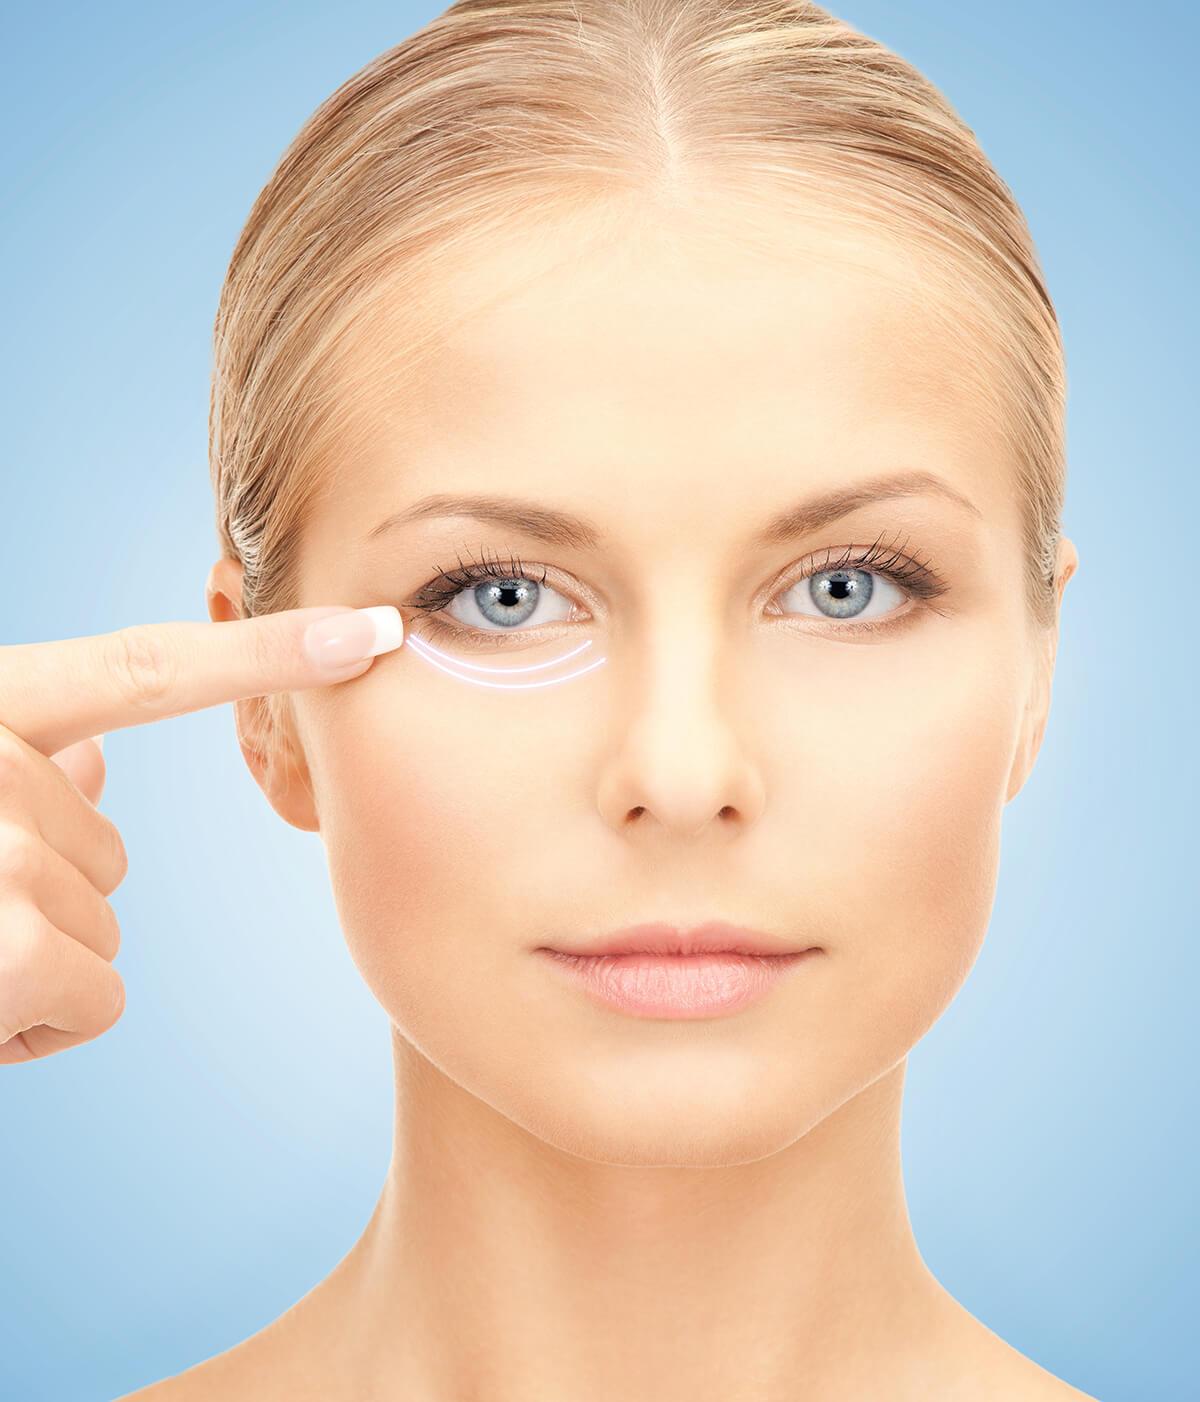 Cosmetic Eye Surgery Benefits in Laguna Hills CA Area